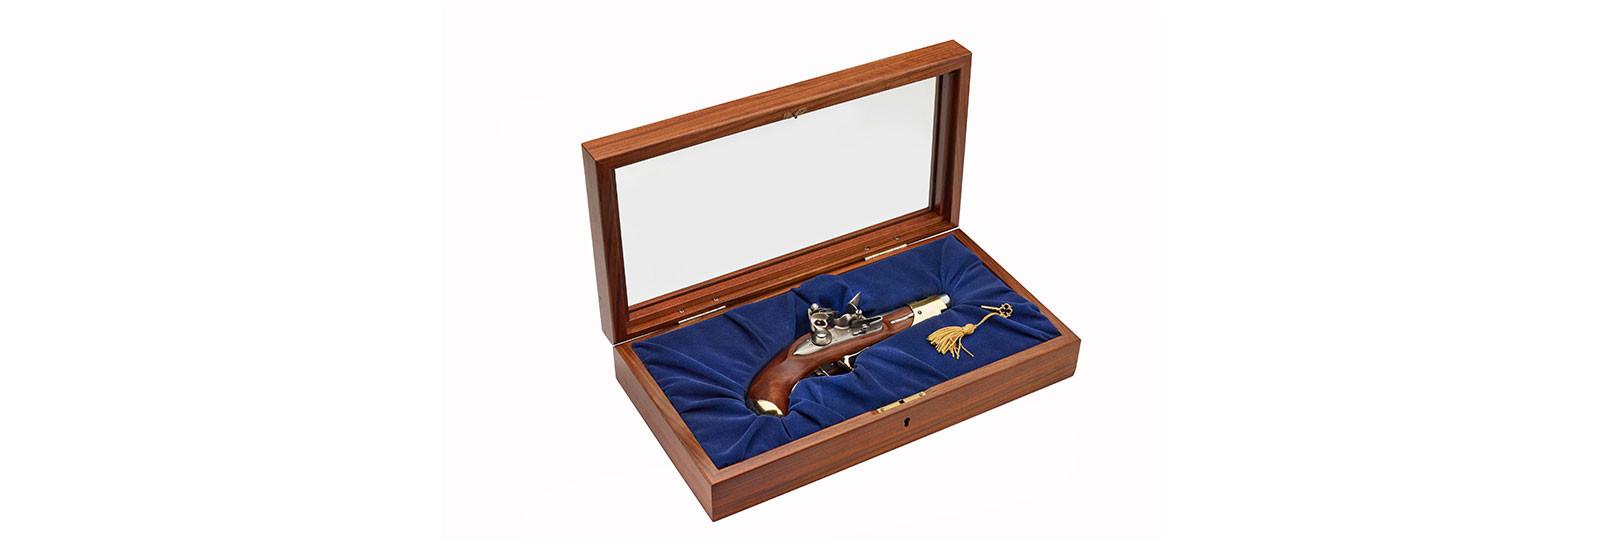 Mod.1814 p.reale carabinieri c/cofanetto